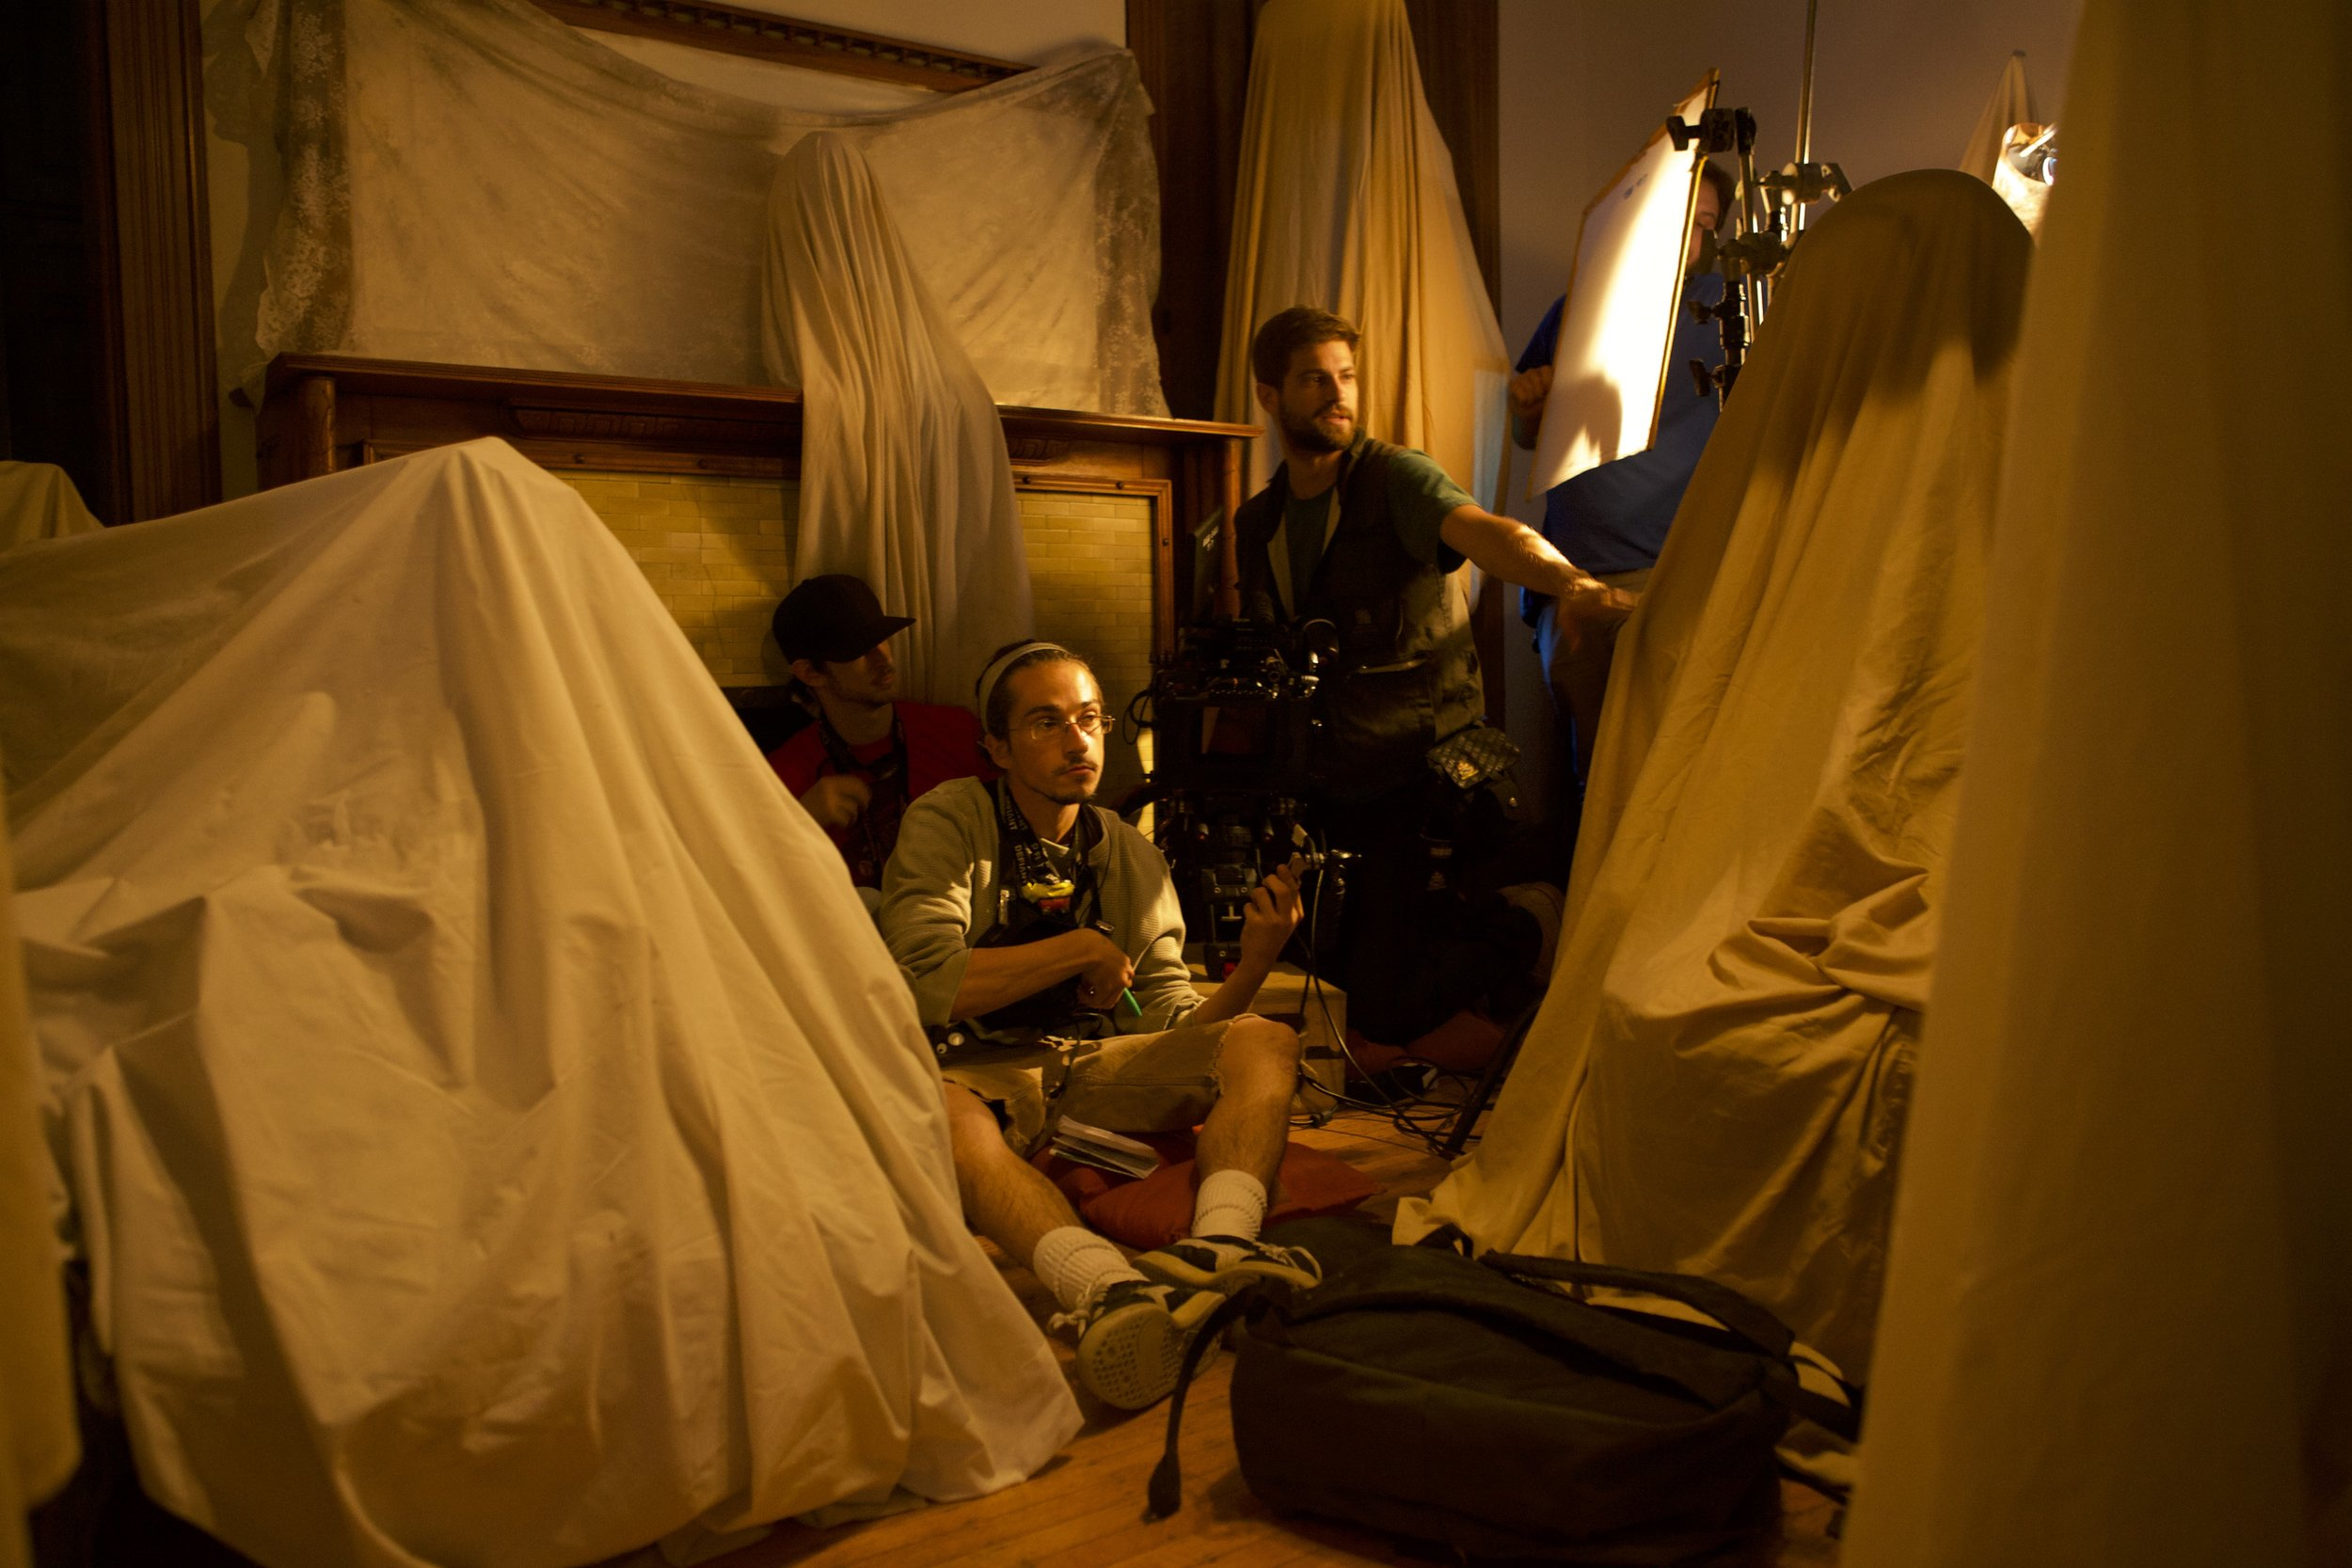 Preparing a setup in the sheet-covered studio